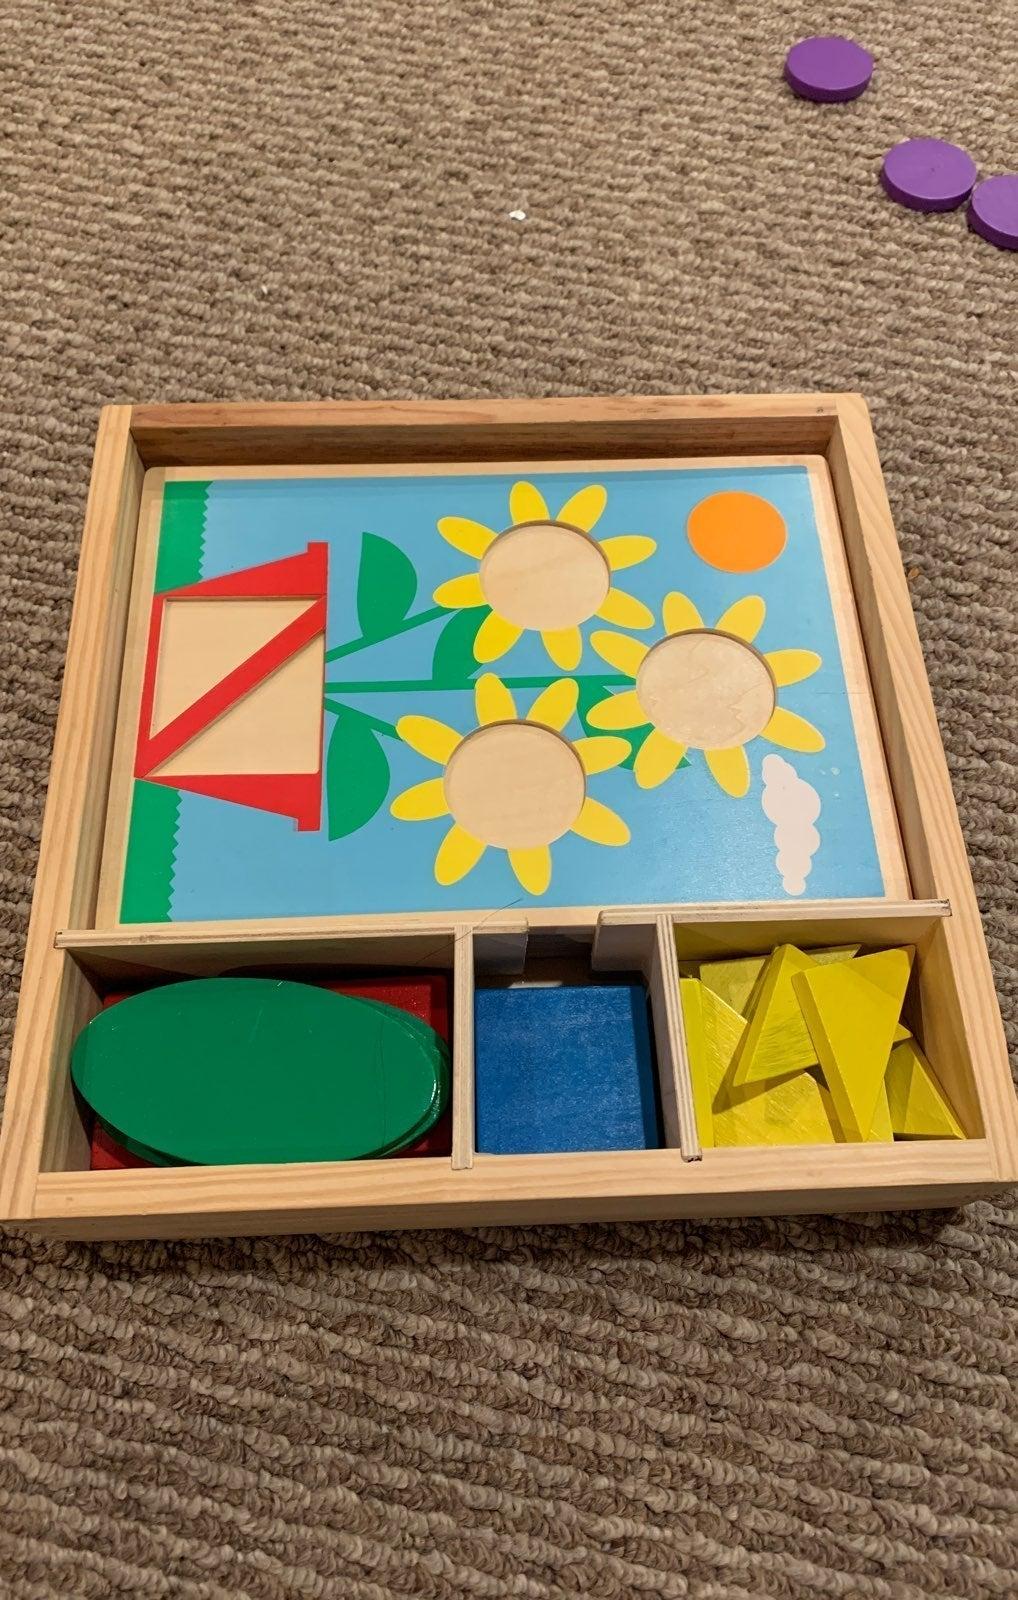 Melissa and doug pattern block puzzles